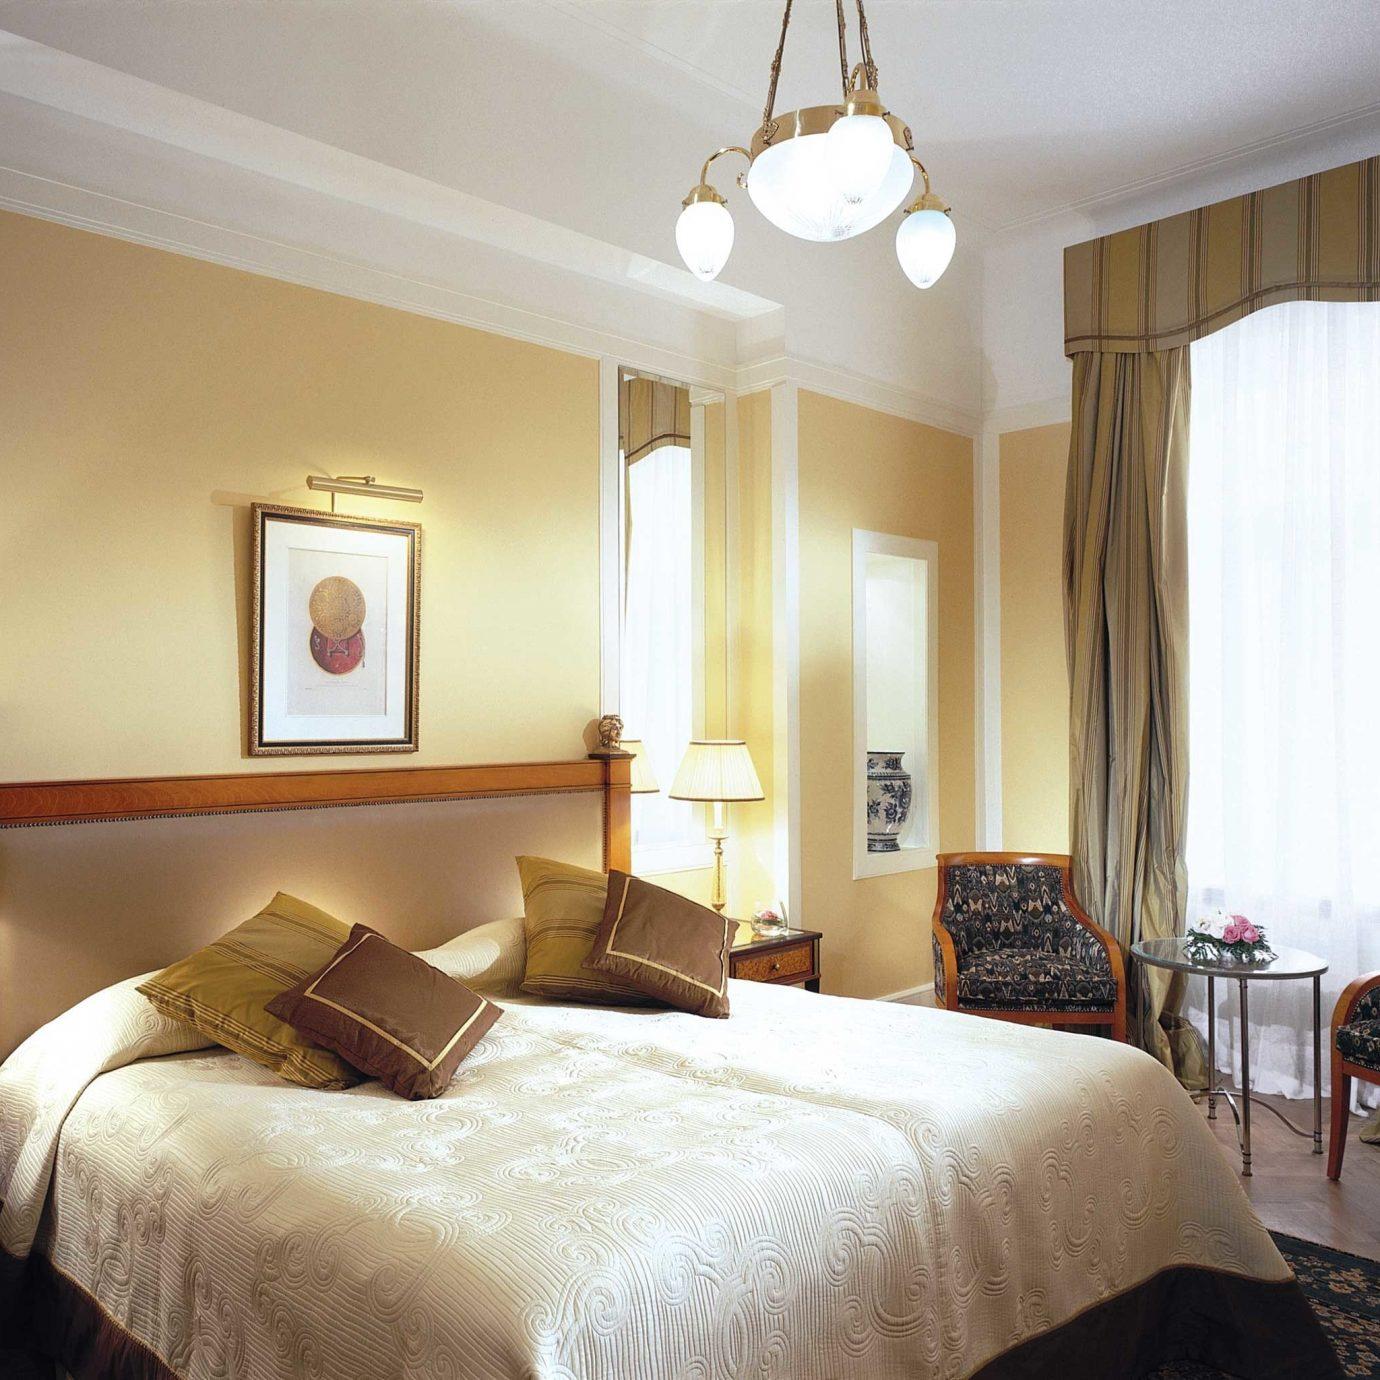 Bedroom Hip Hotels Luxury Luxury Travel Suite sofa property scene double living room cottage Villa flat lamp